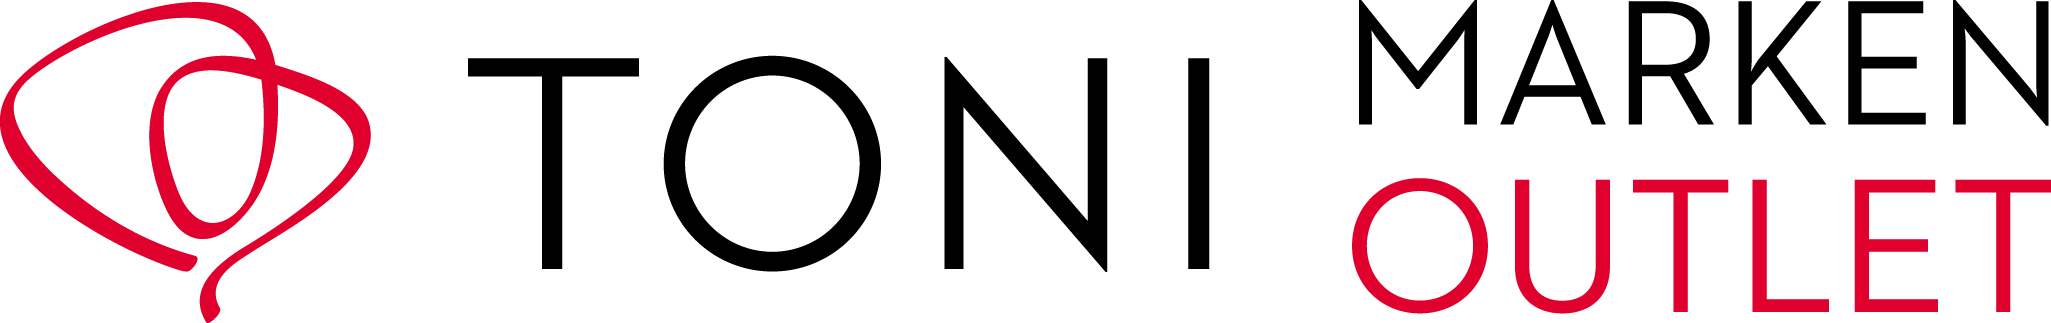 Toni-Outlet-2012